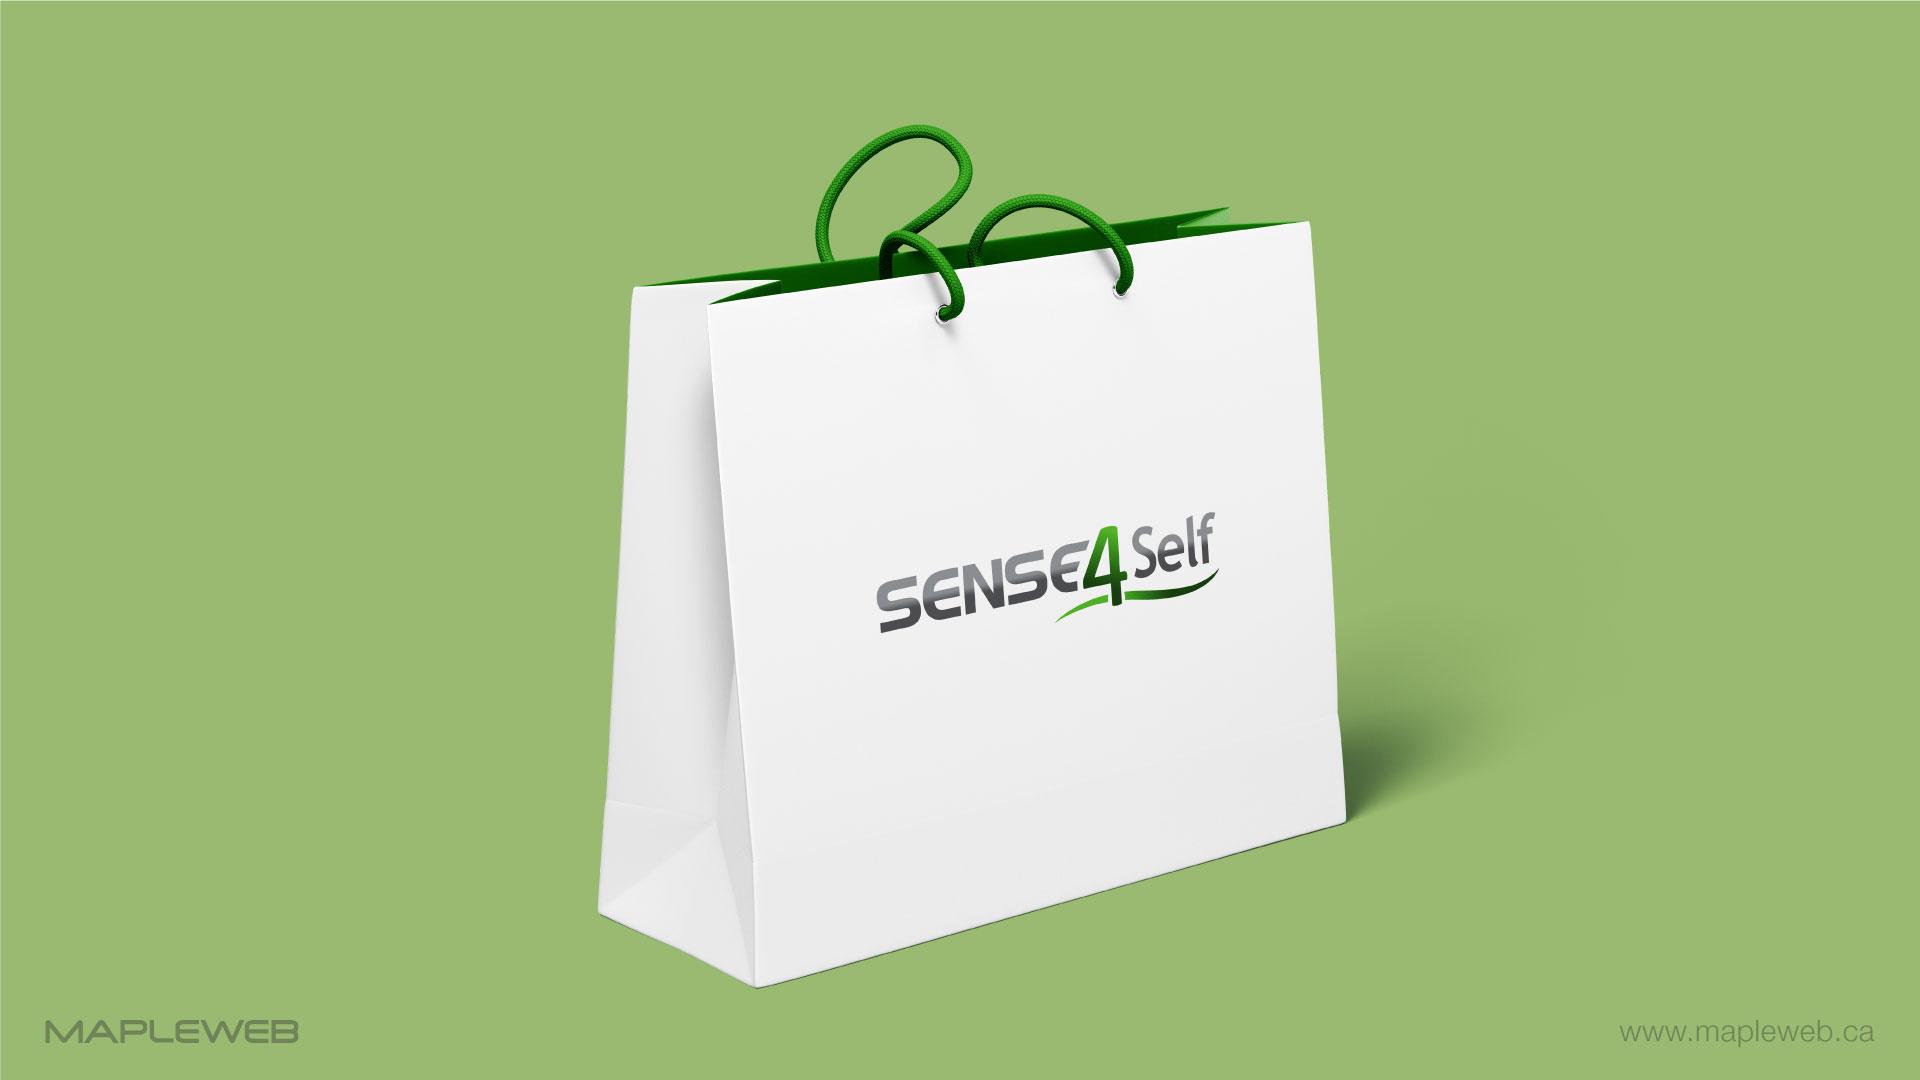 sense-4-self-brand-logo-design-by-mapleweb-vancouver-canada-shopping-bag-mock